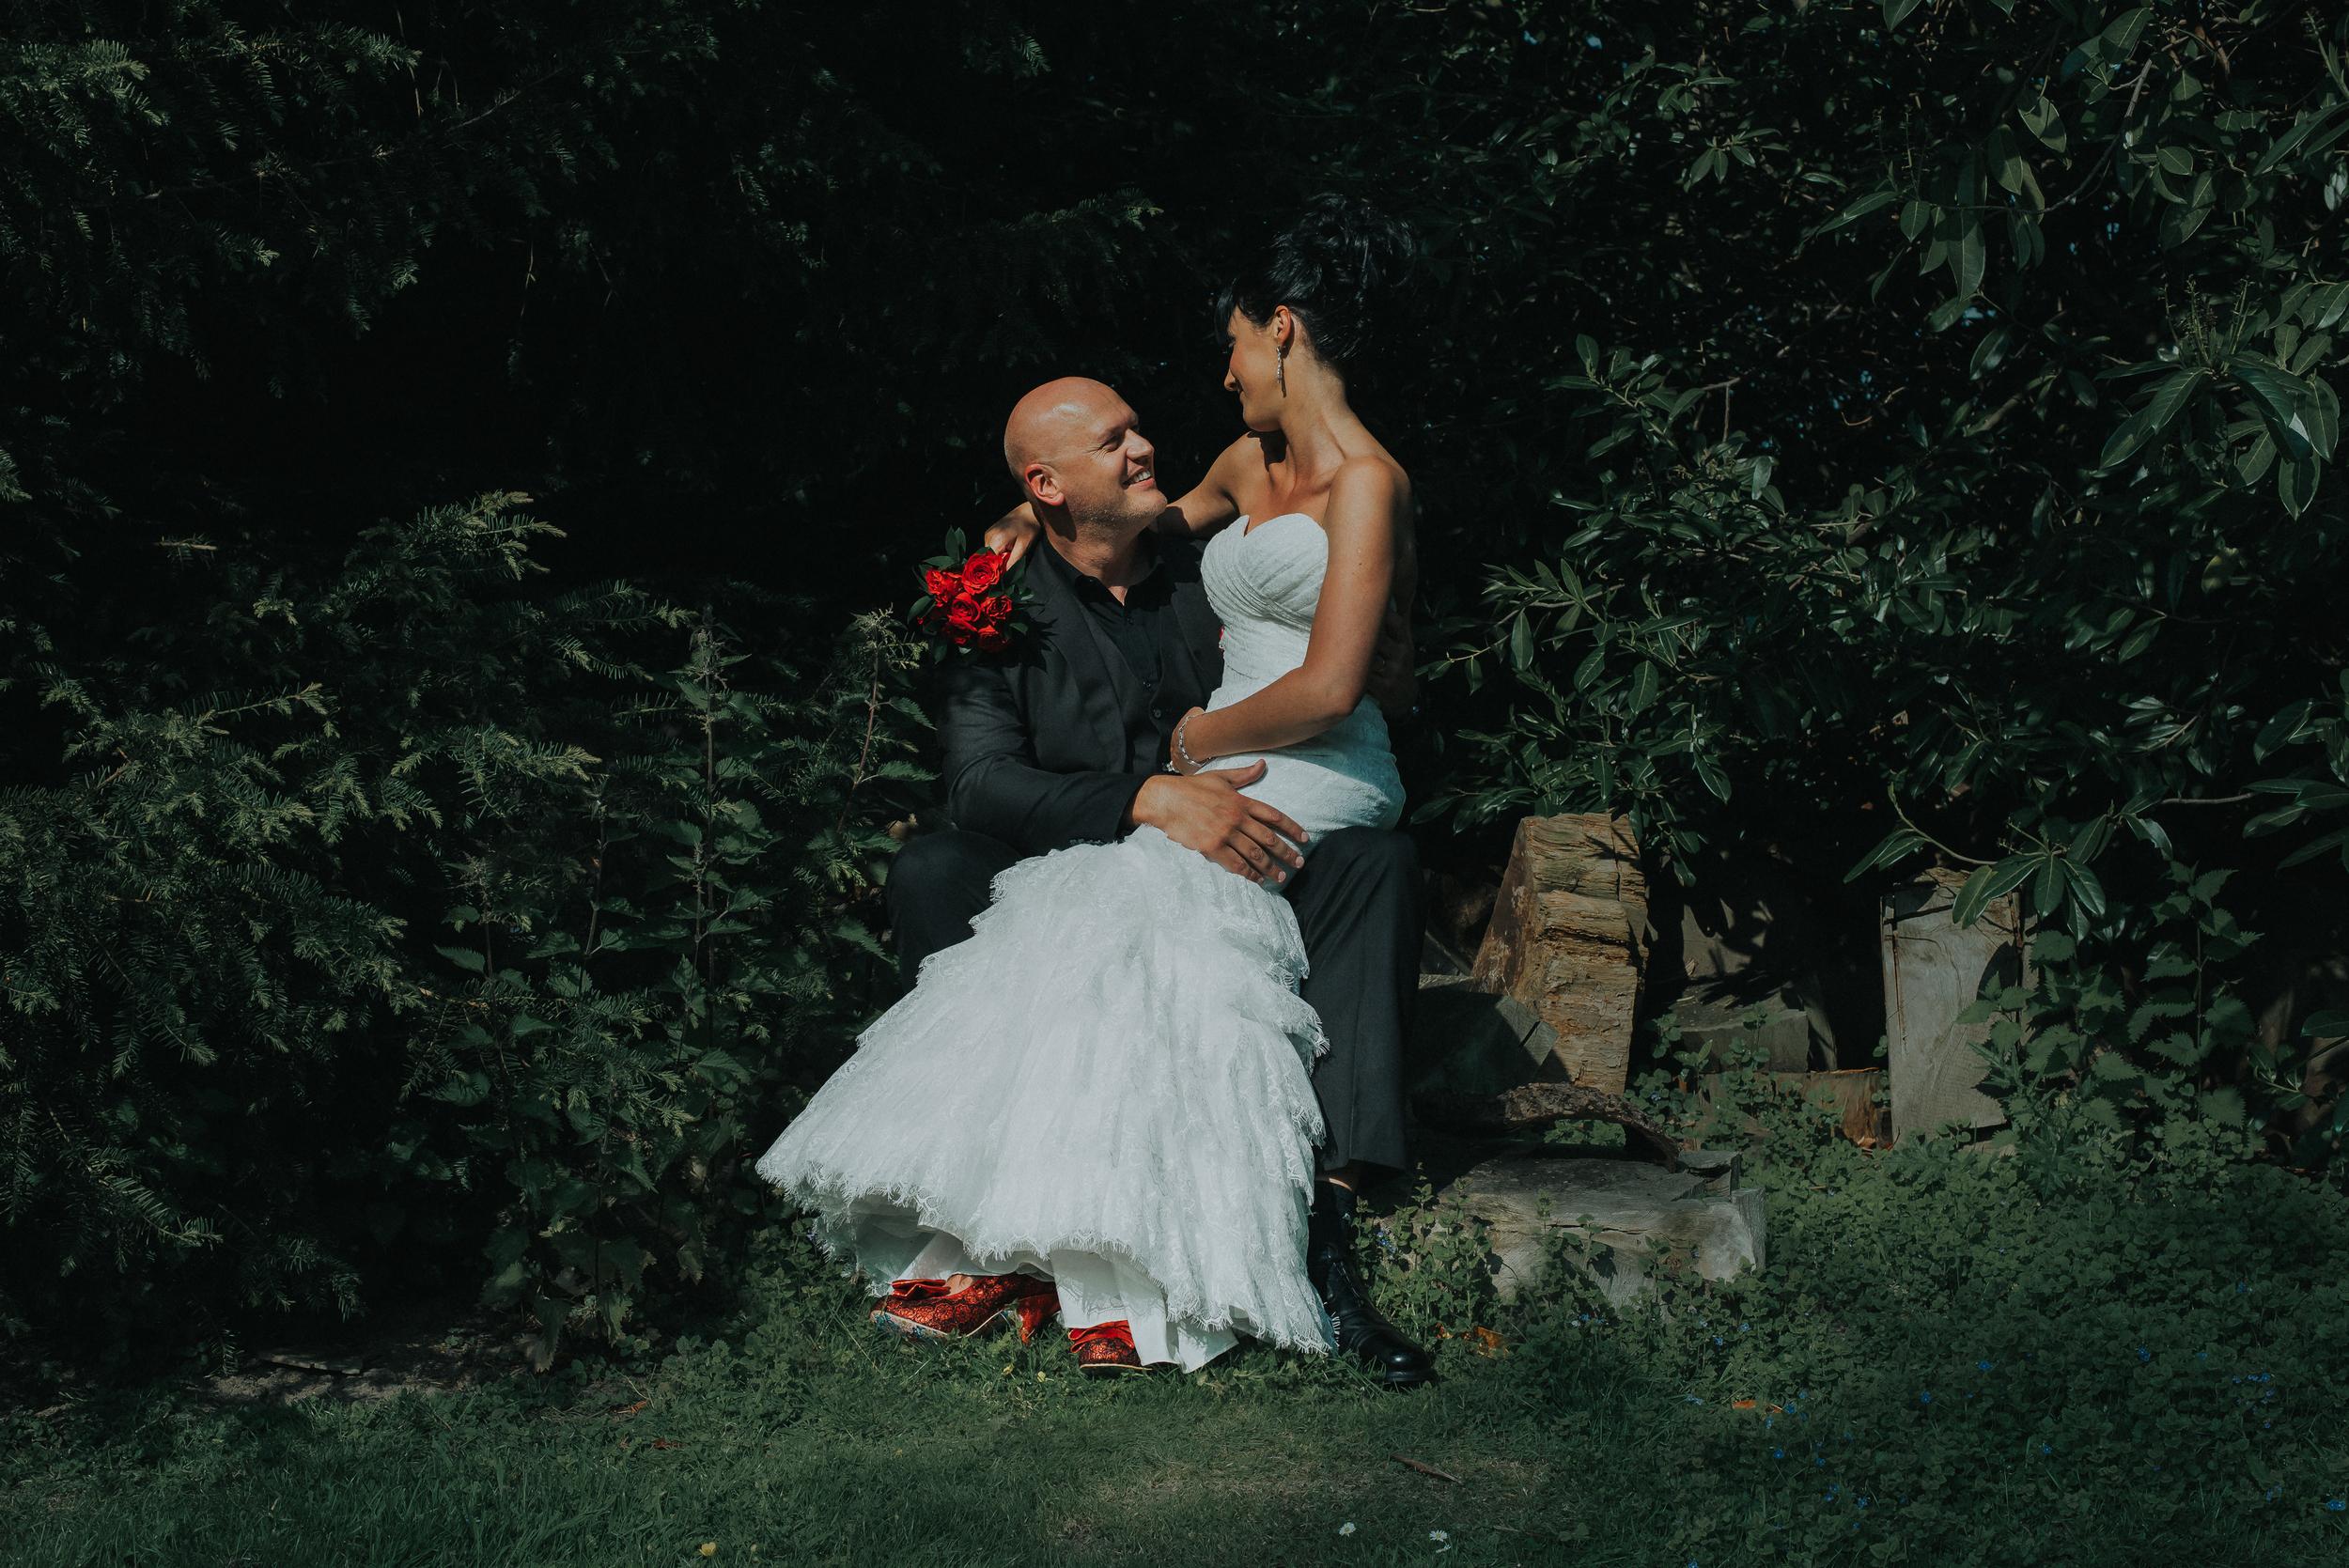 Sasha and Tim Wedding Photography Jay Tunbridge178.jpg